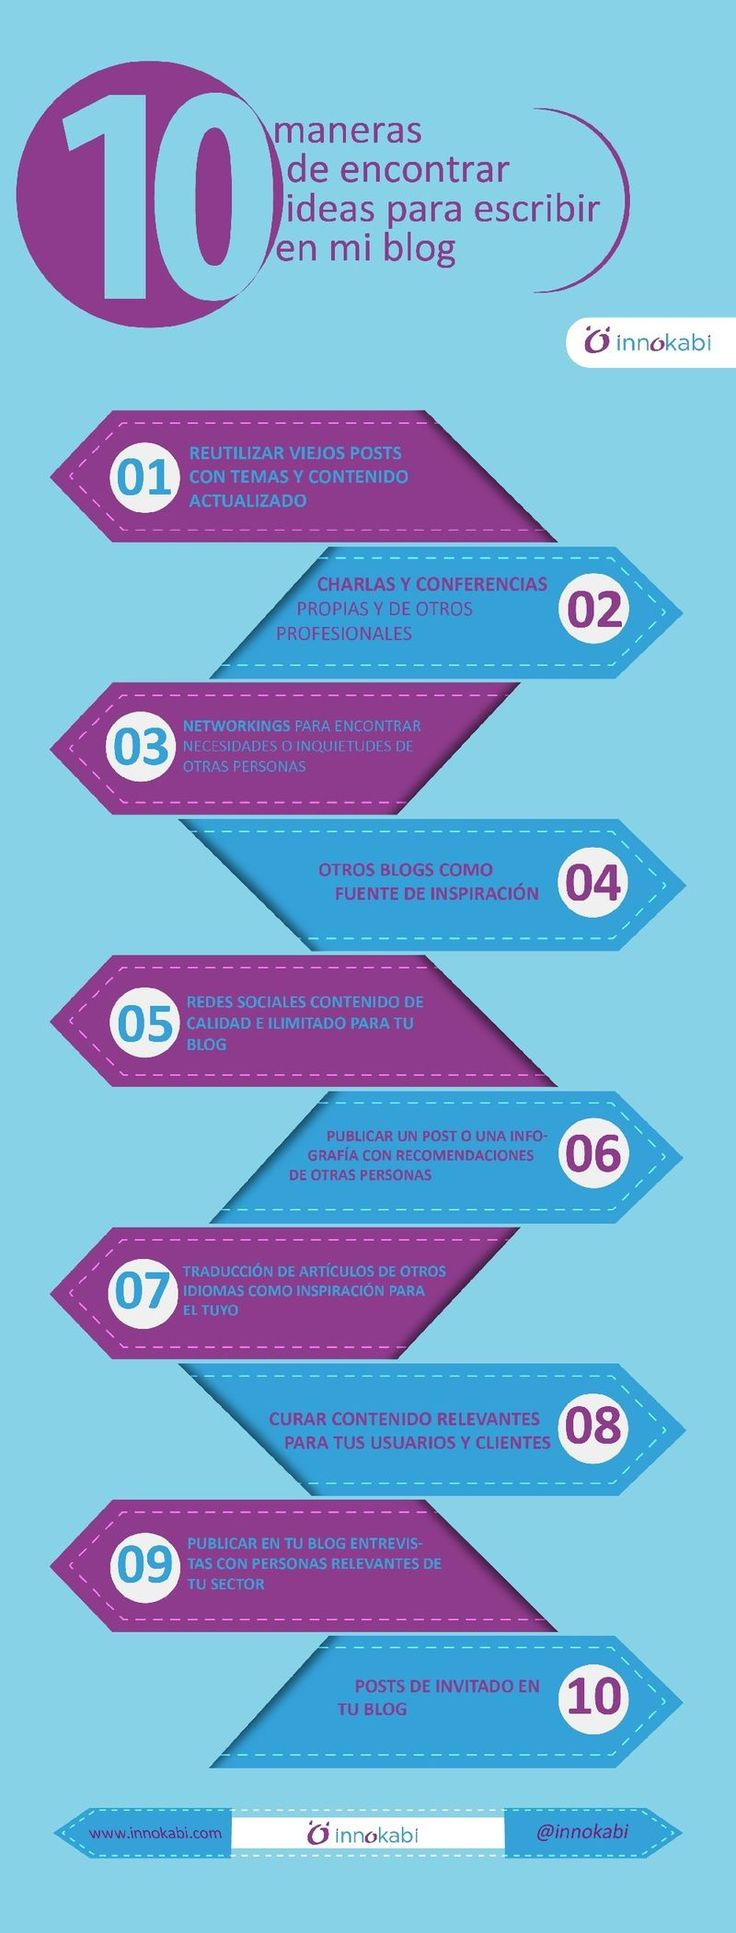 10 maneras de encontrar ideas para escribir en mi blog. Infografía en español. #ComunityManager